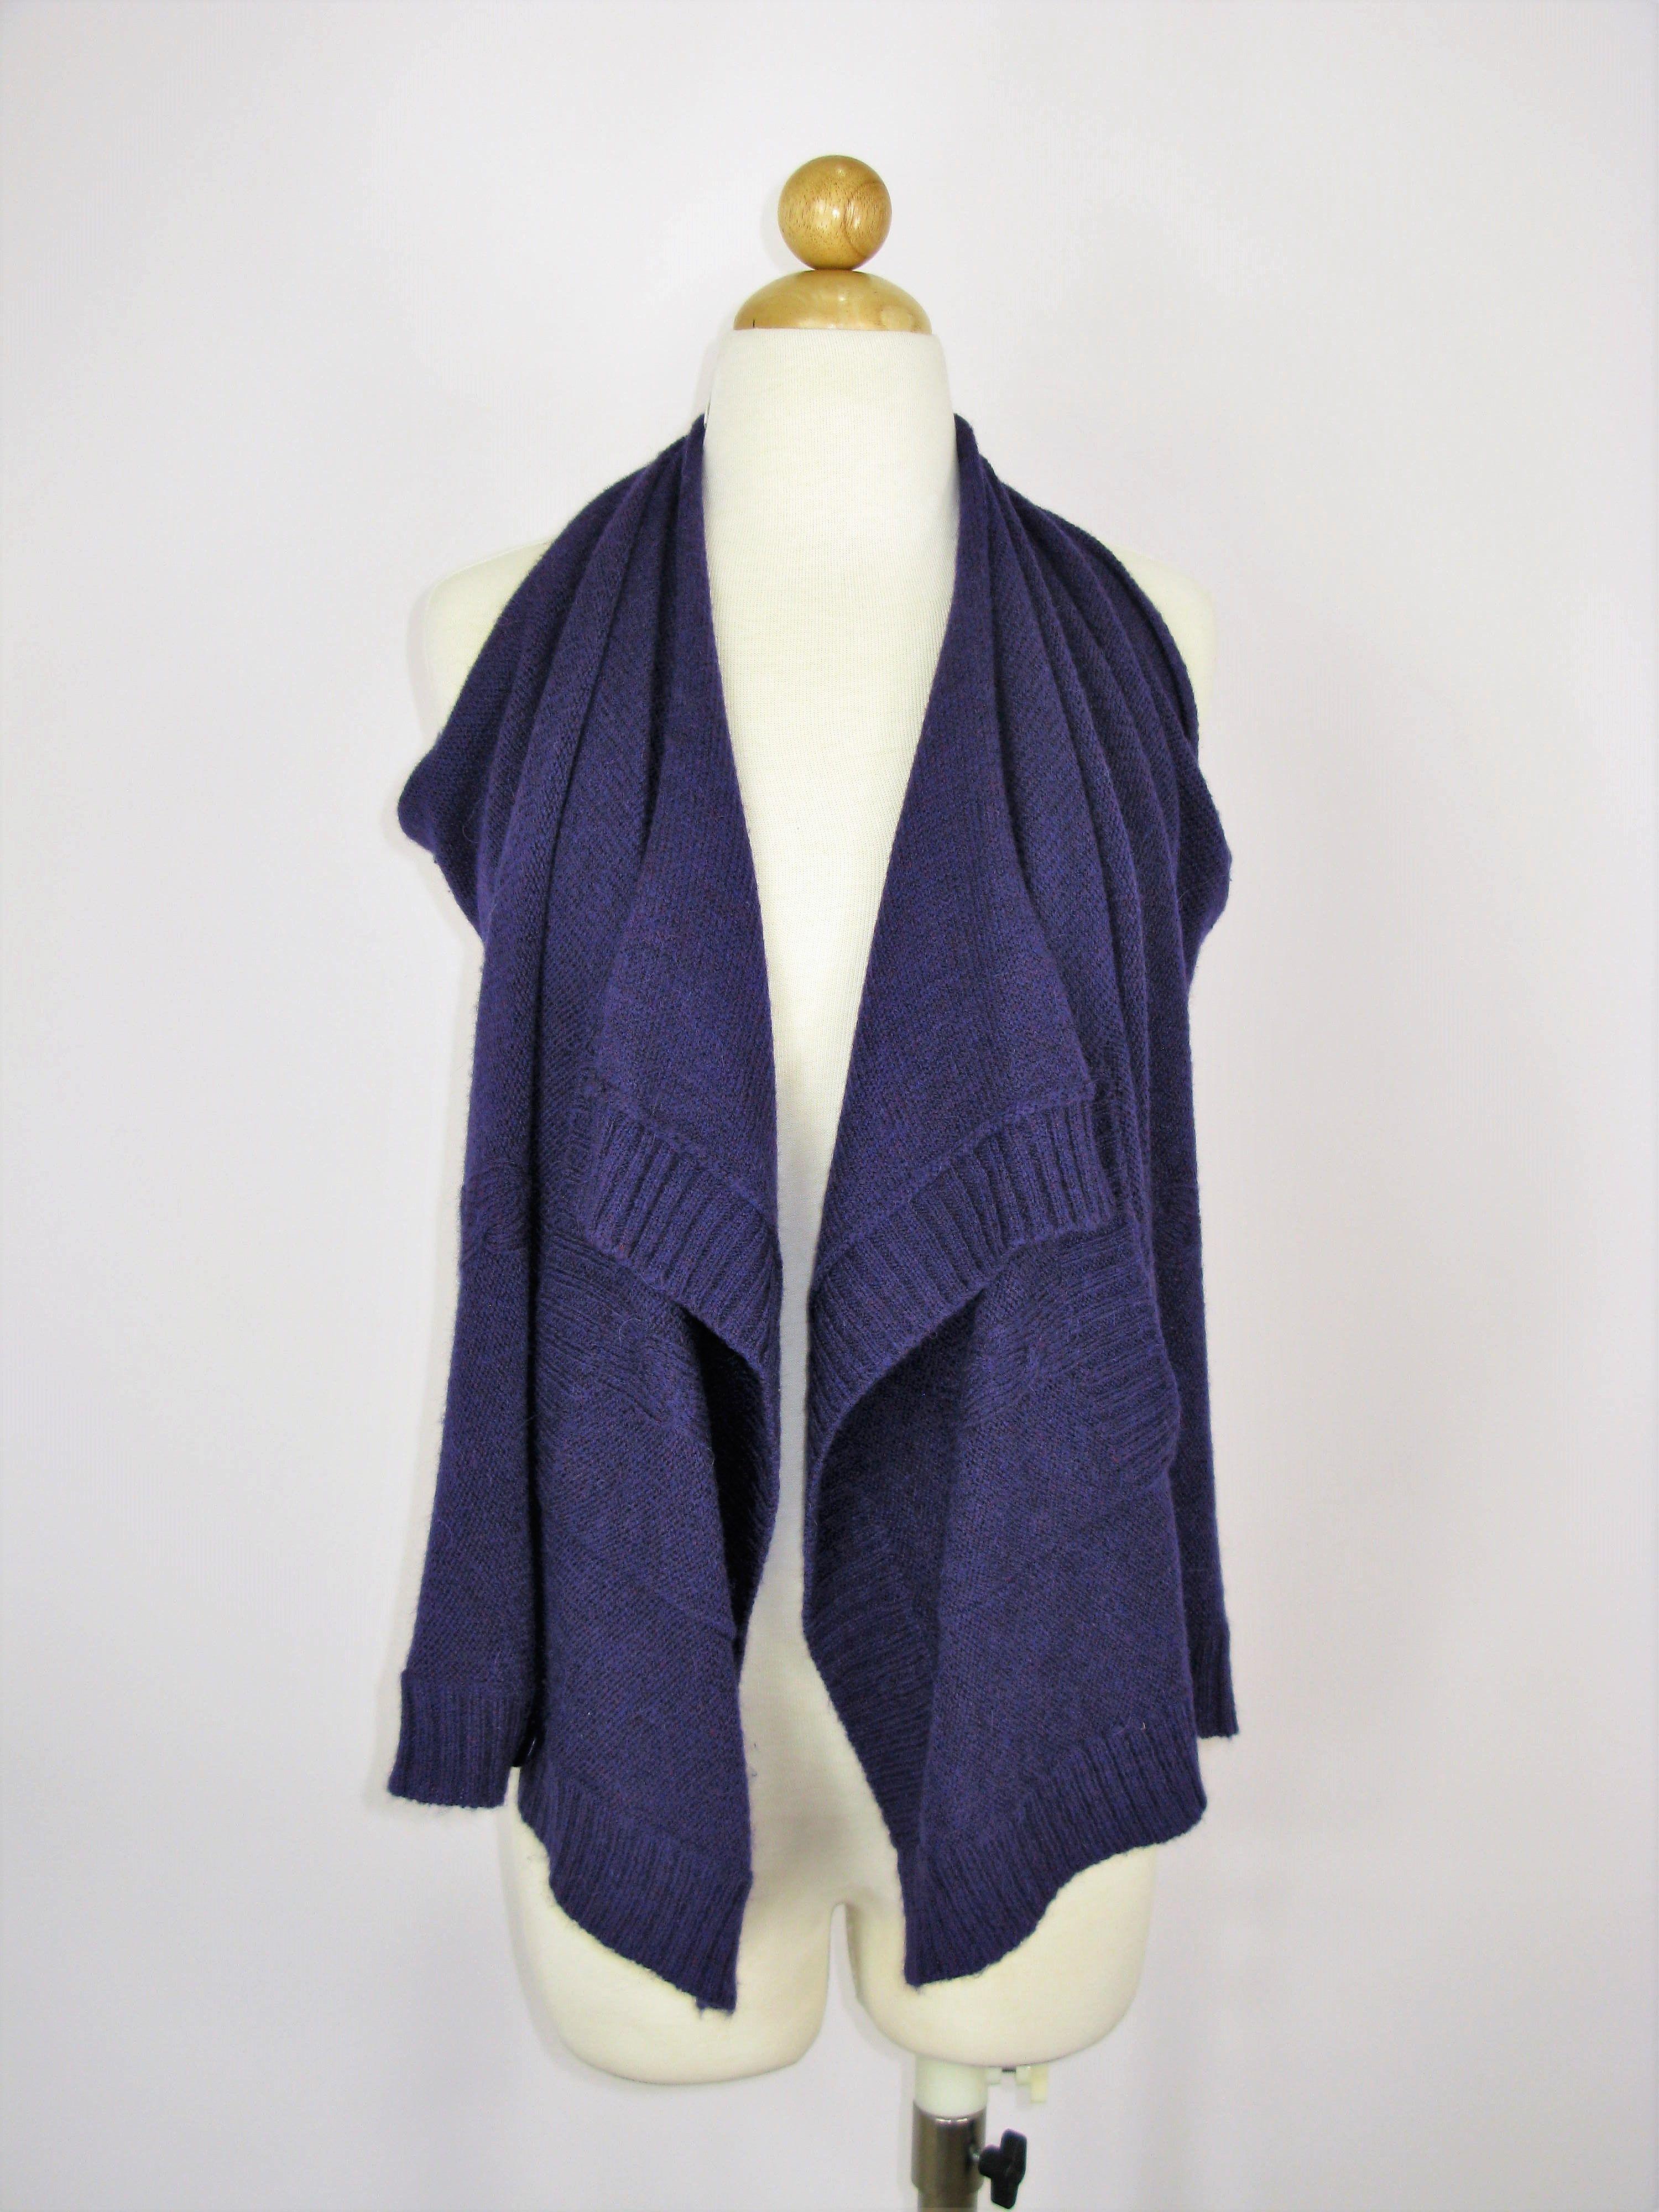 Mason Draped Sleeveless Open Cardigan Sweater Vest Top M ...